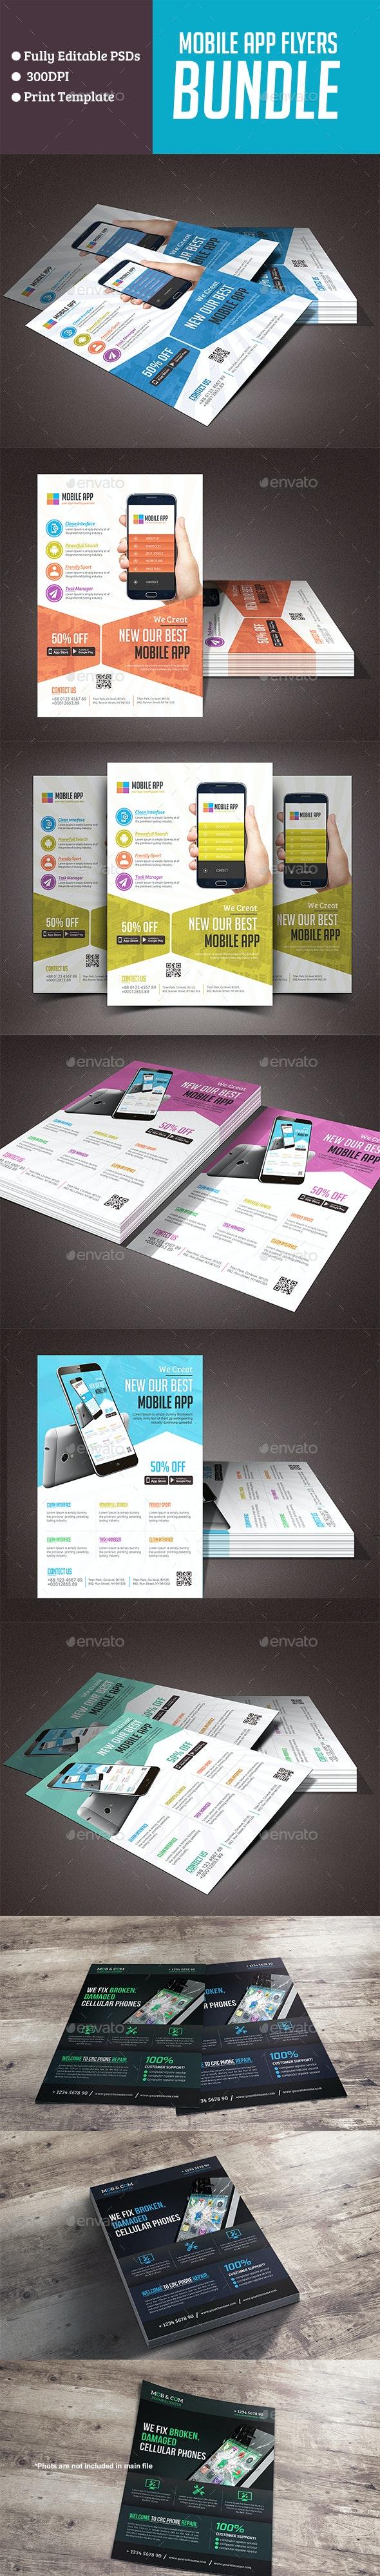 Mobile App & Mob Repair Flyers Bundle - Flyers Print Templates